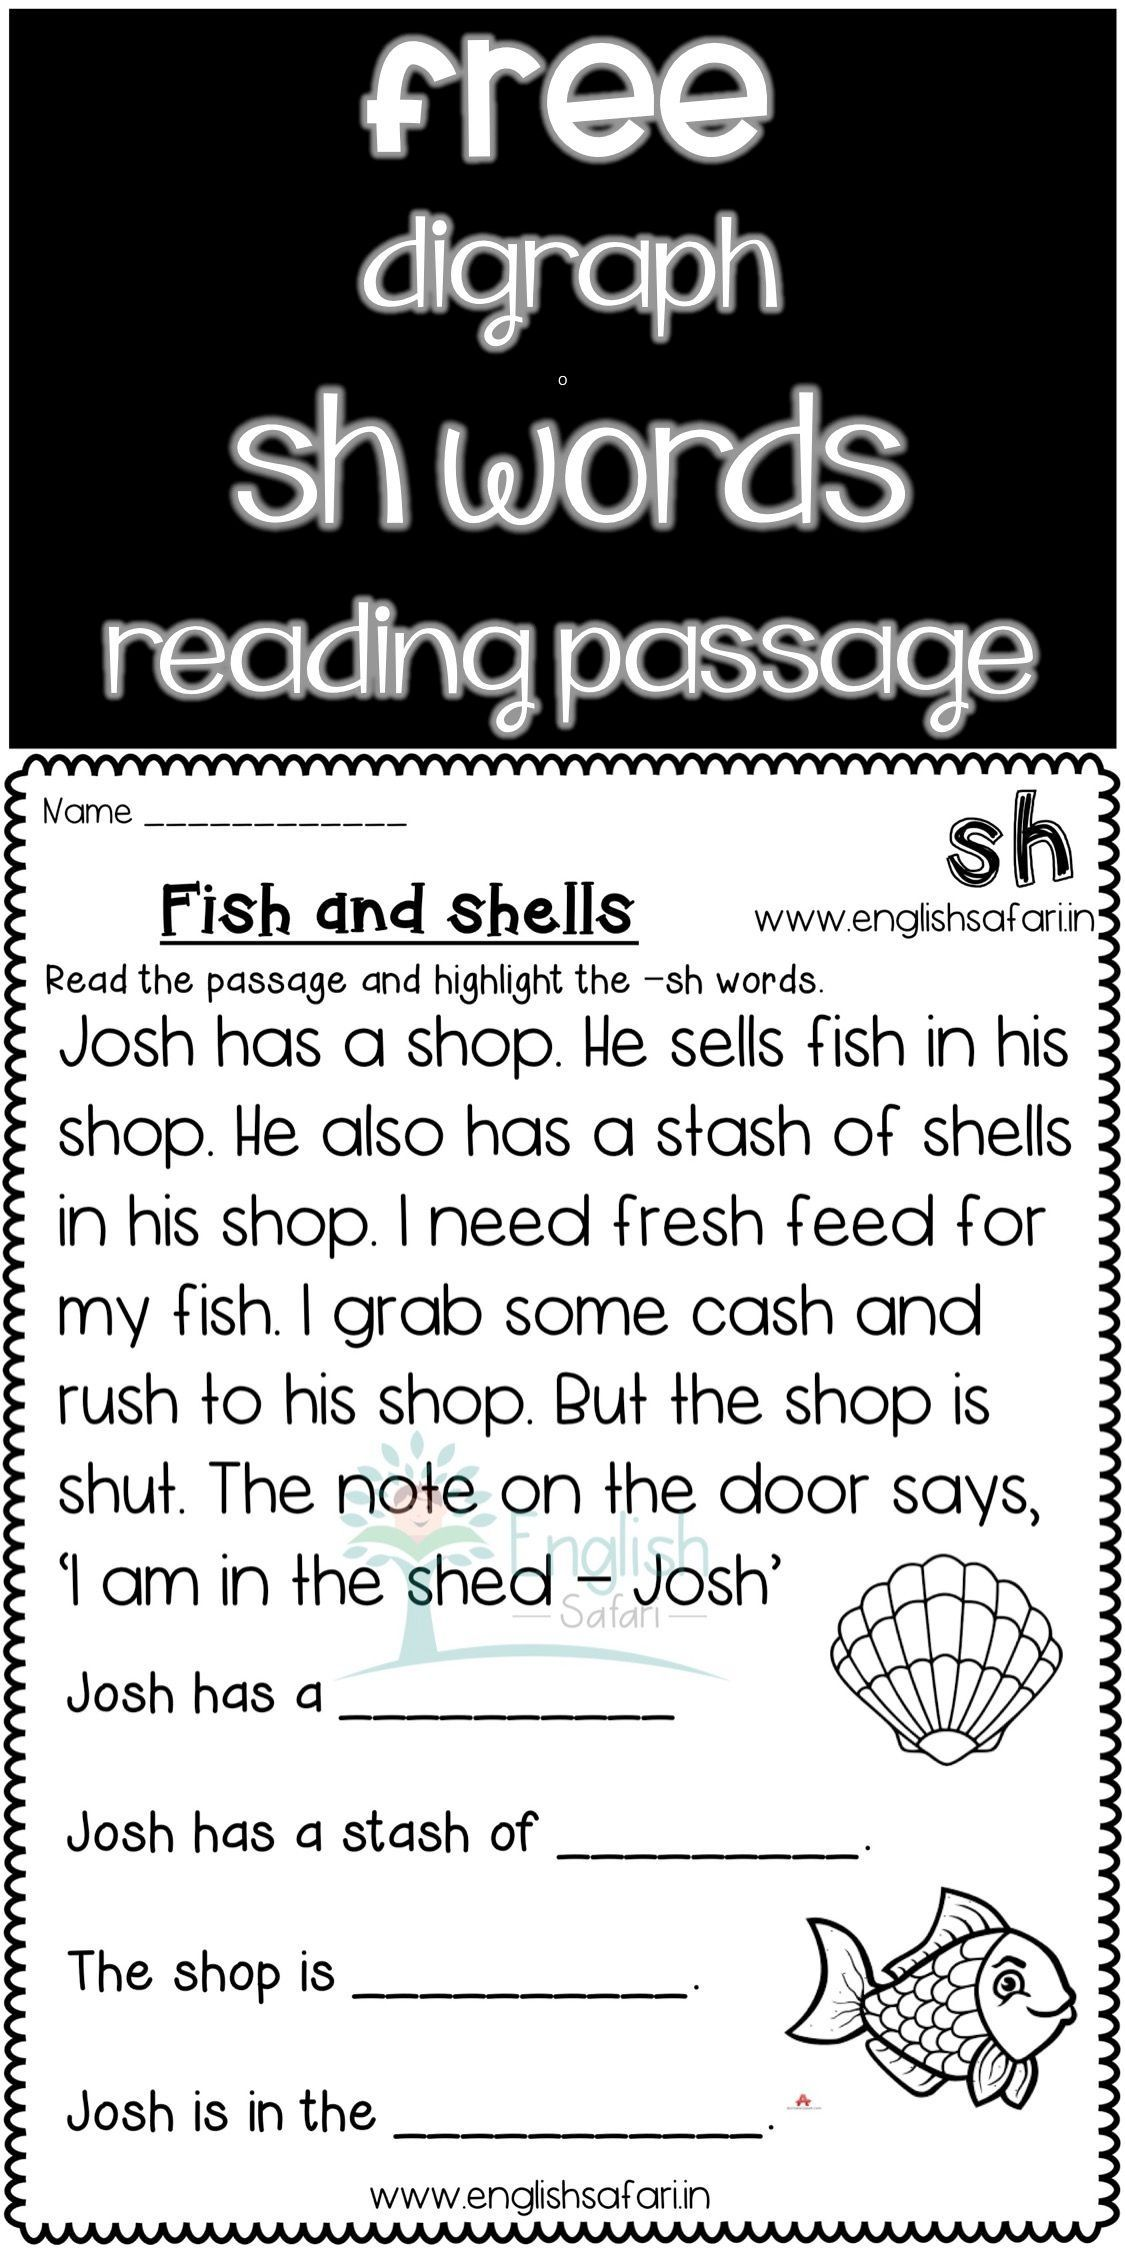 FREE** sh words reading comprehension www.worksheetsenglish.com   Phonics  reading [ 2249 x 1125 Pixel ]